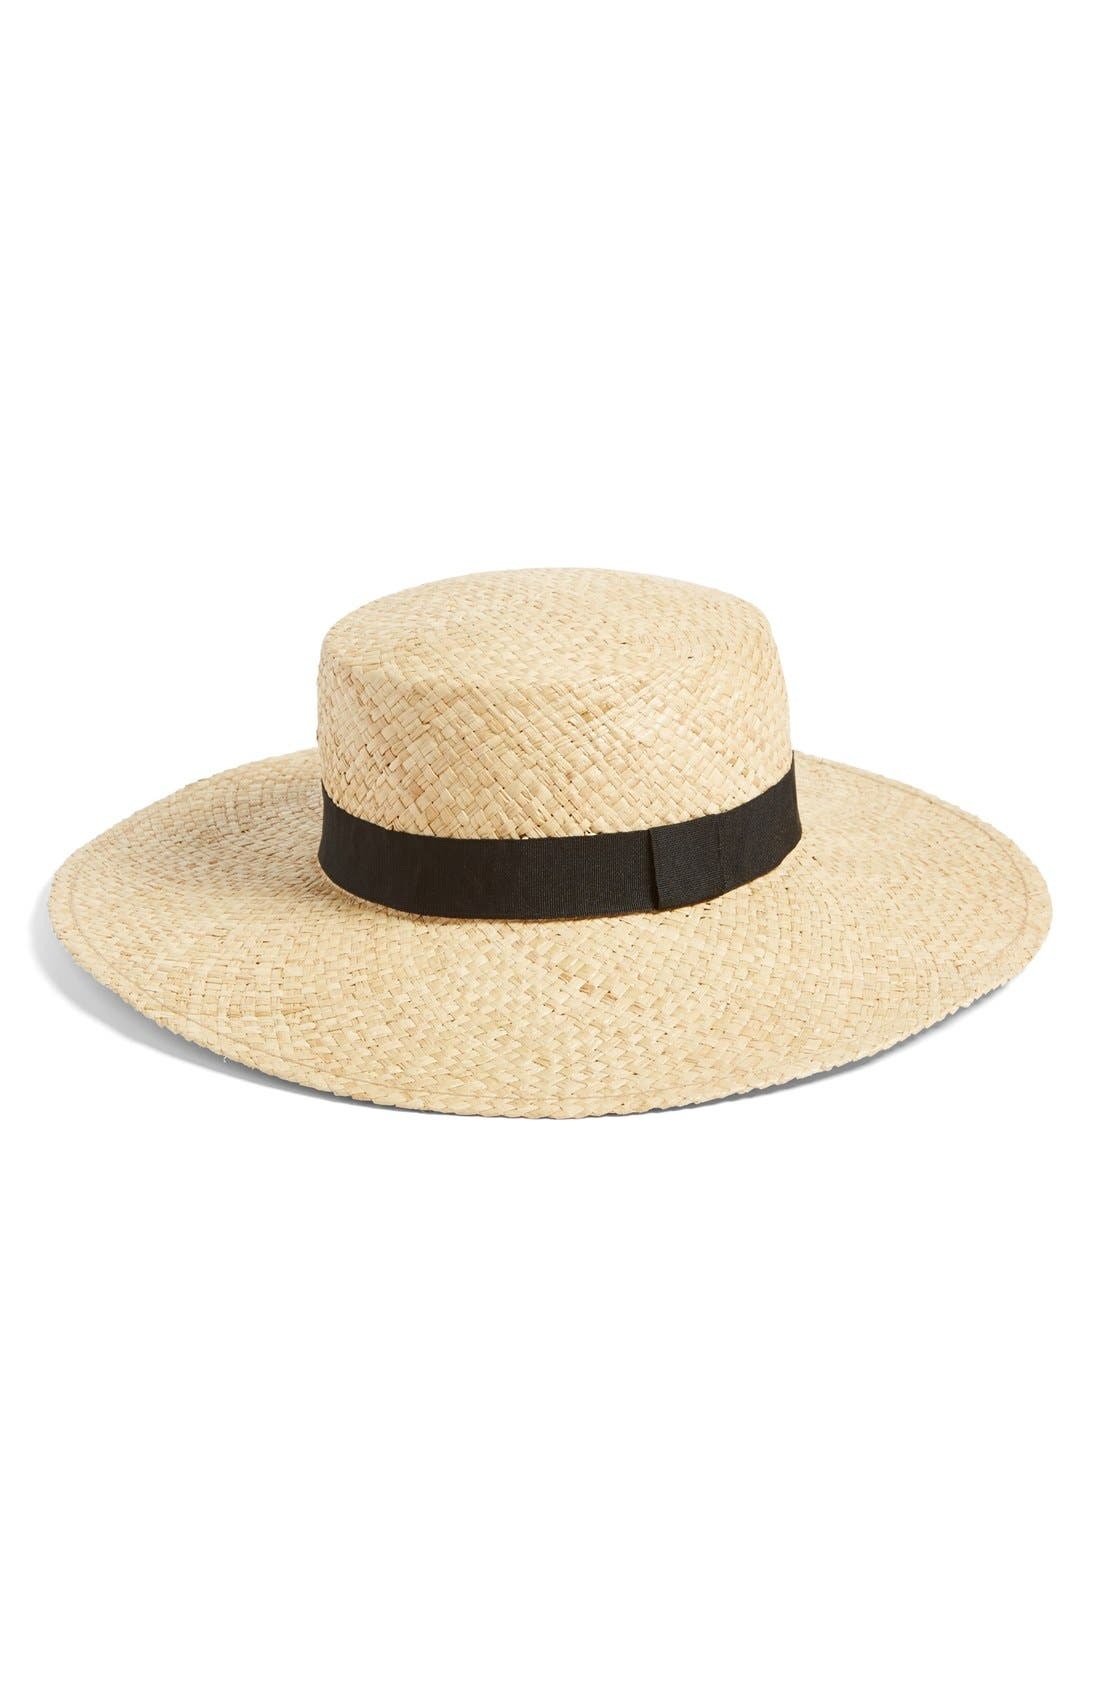 BP Wide Brim Raffia Boater Hat,                         Main,                         color, 235